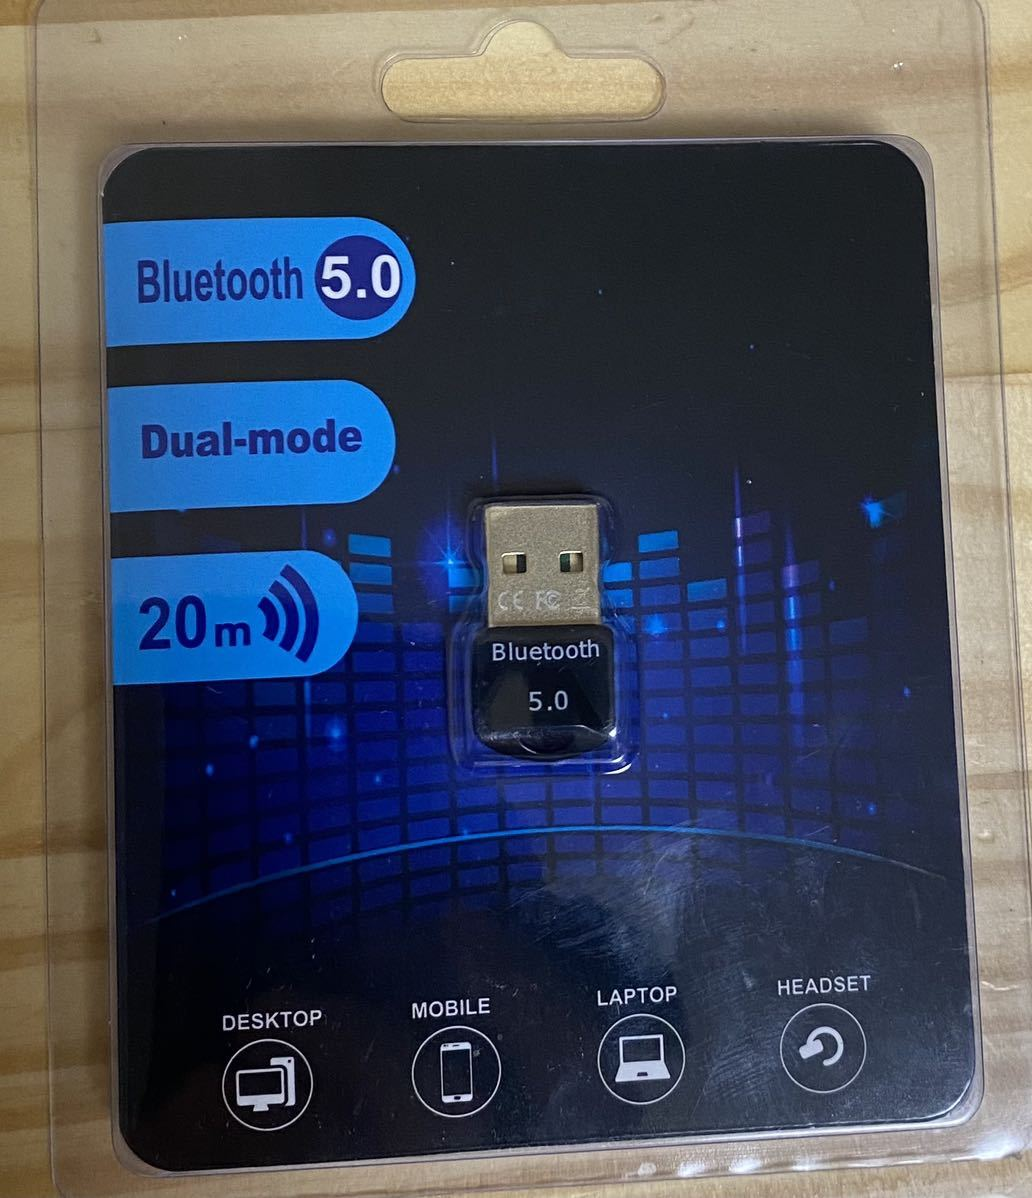 Bluetoothアダプター 5.0 送信機 受信機 ドングル 最大通信距離20m apt-X対応 EDR/LE対応Windows 7/8/8.1/10(32/64bit) 対応 Mac非対応